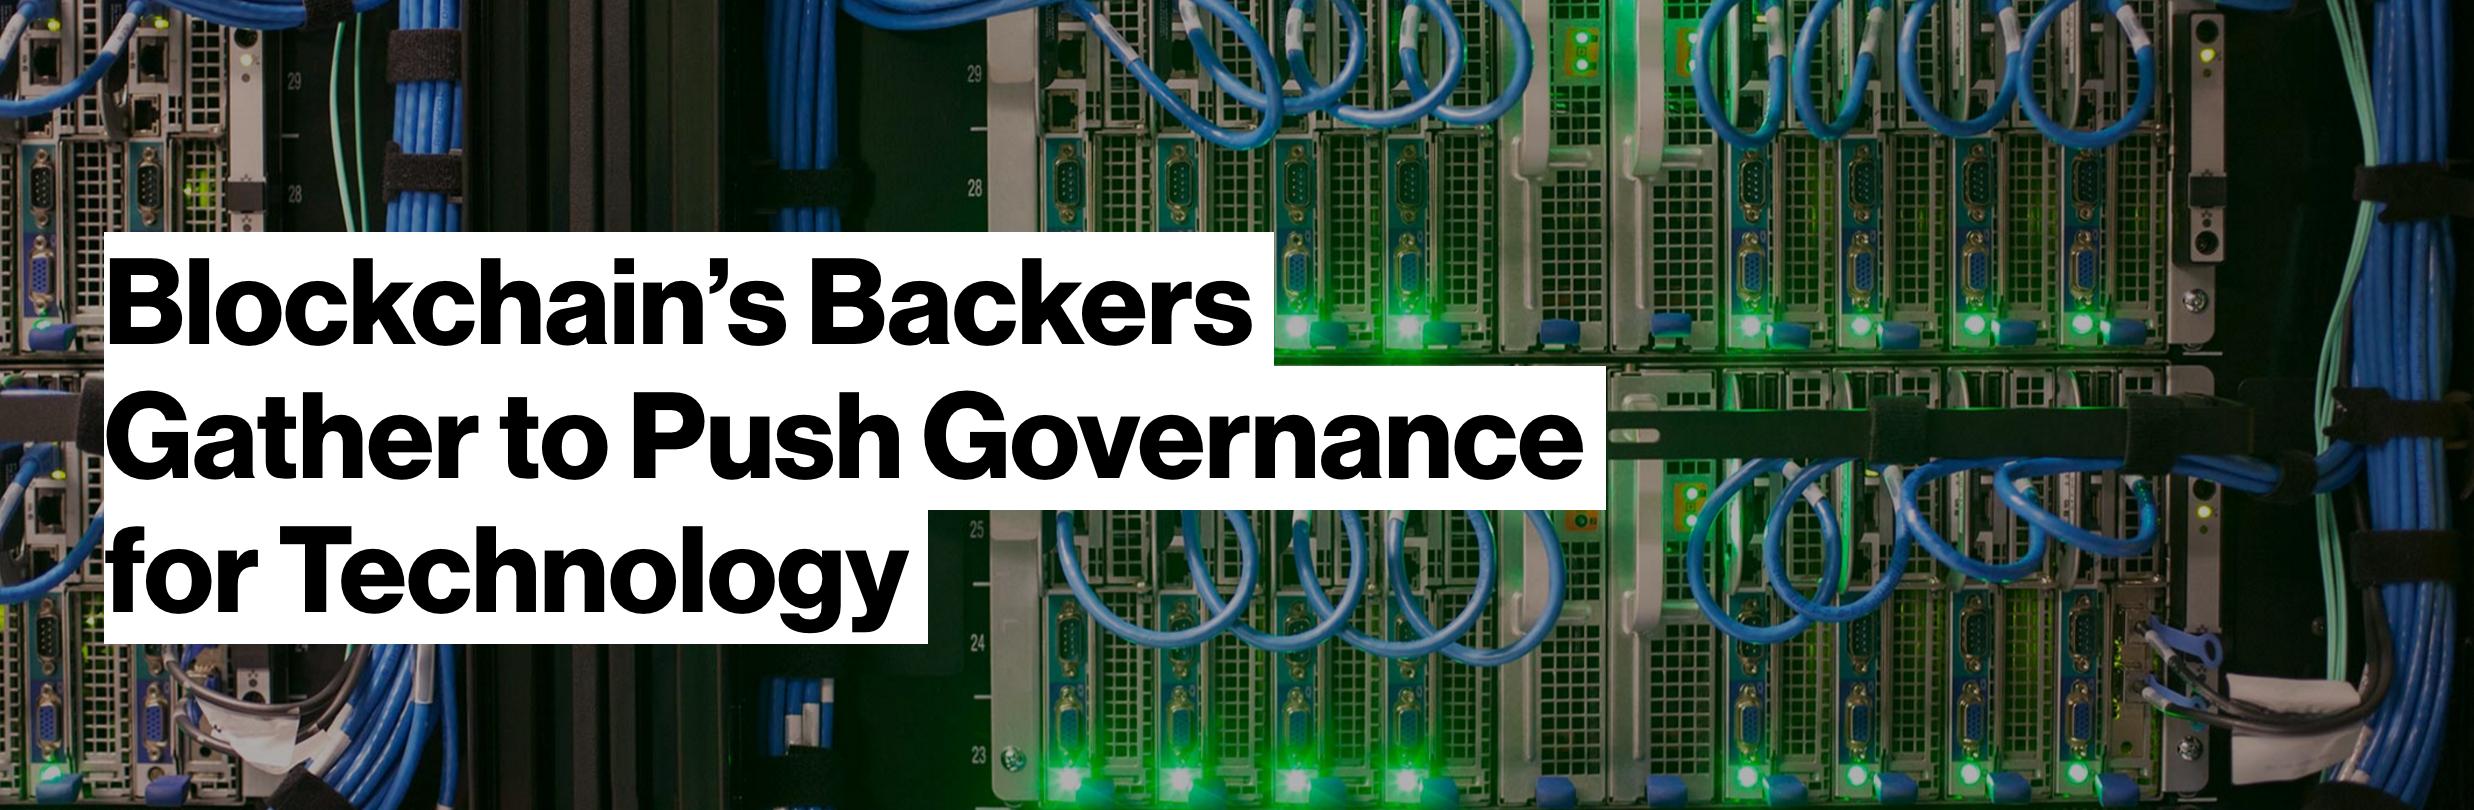 Bloomberg: Blockchain's Backer's Gather to Push Governance for Technology